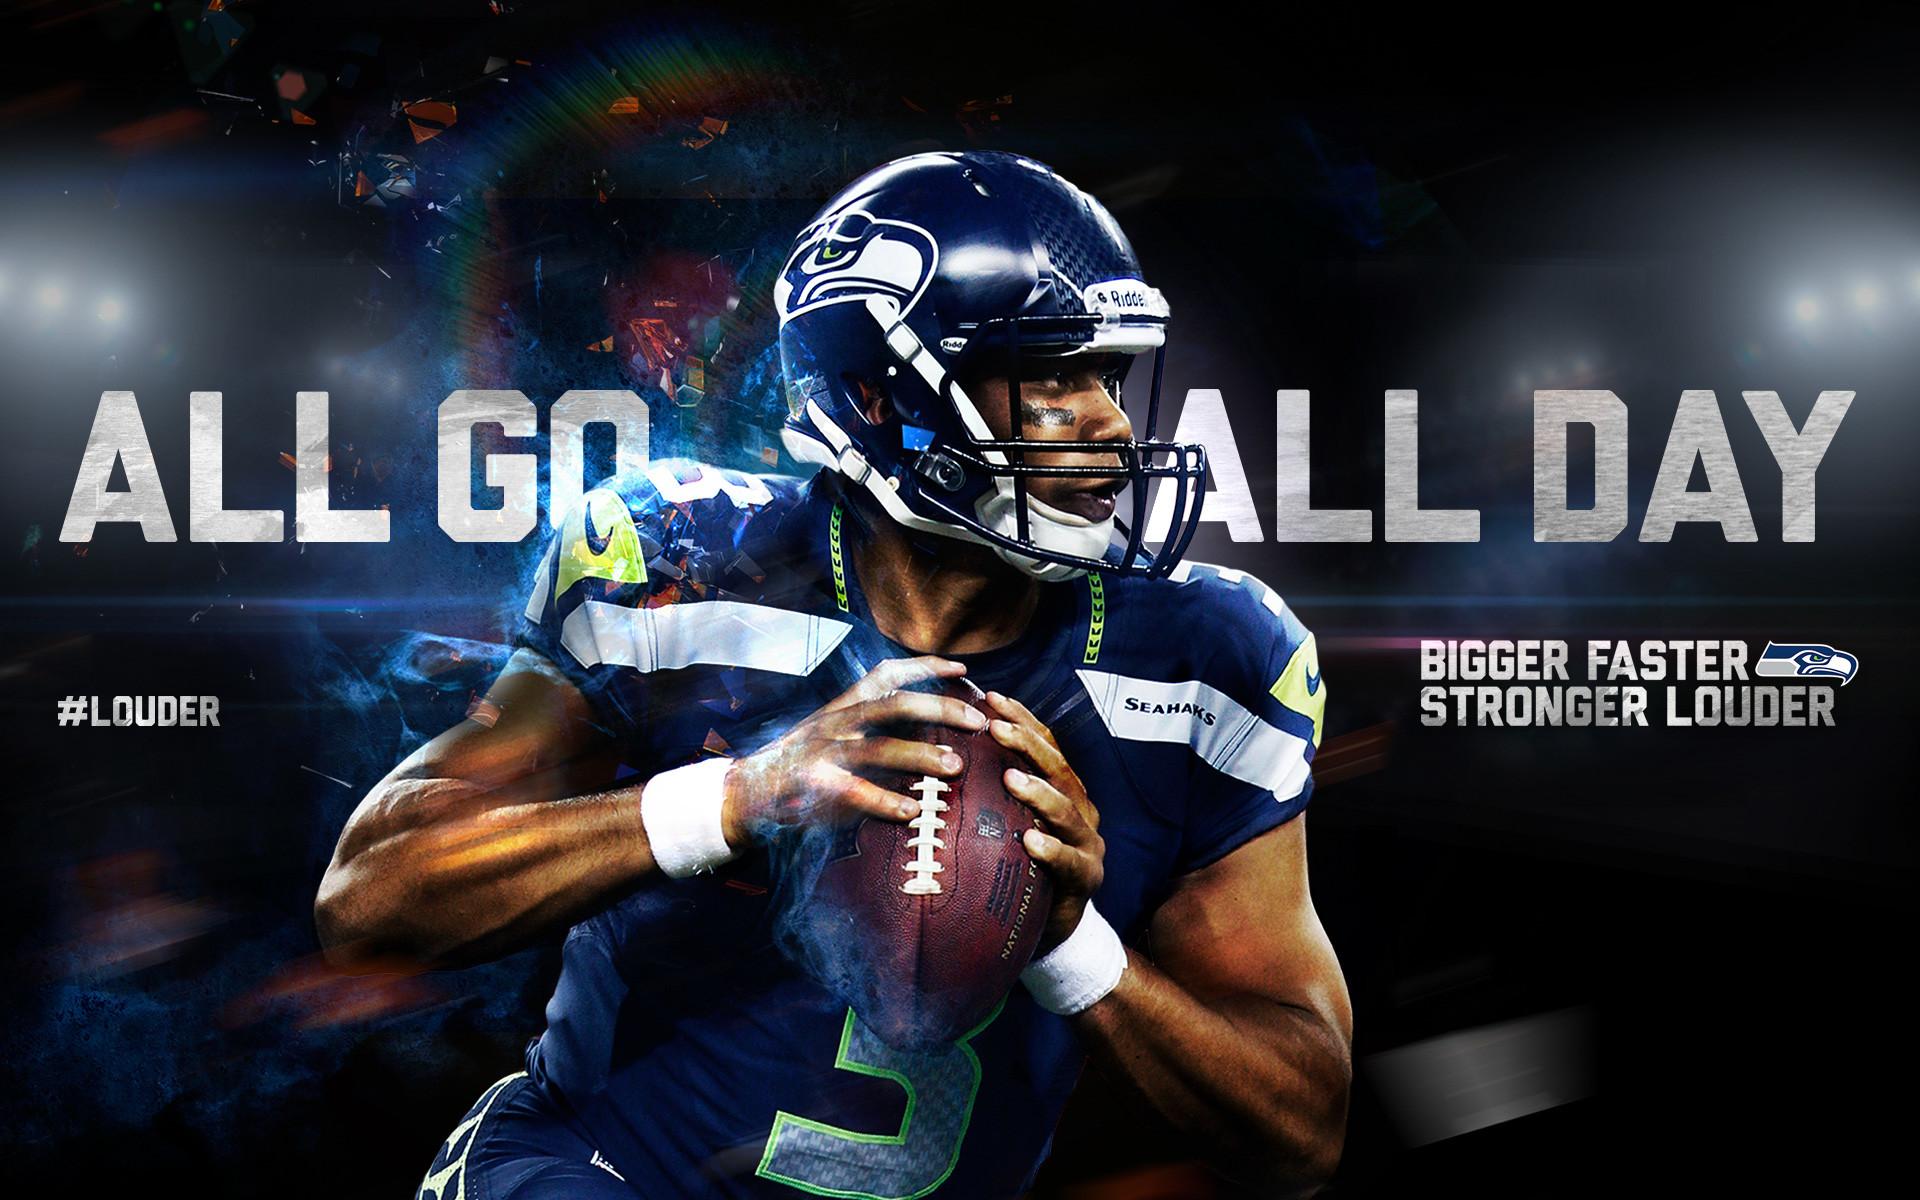 hd seattle seahawks nfl football desktop background images wallpaper .